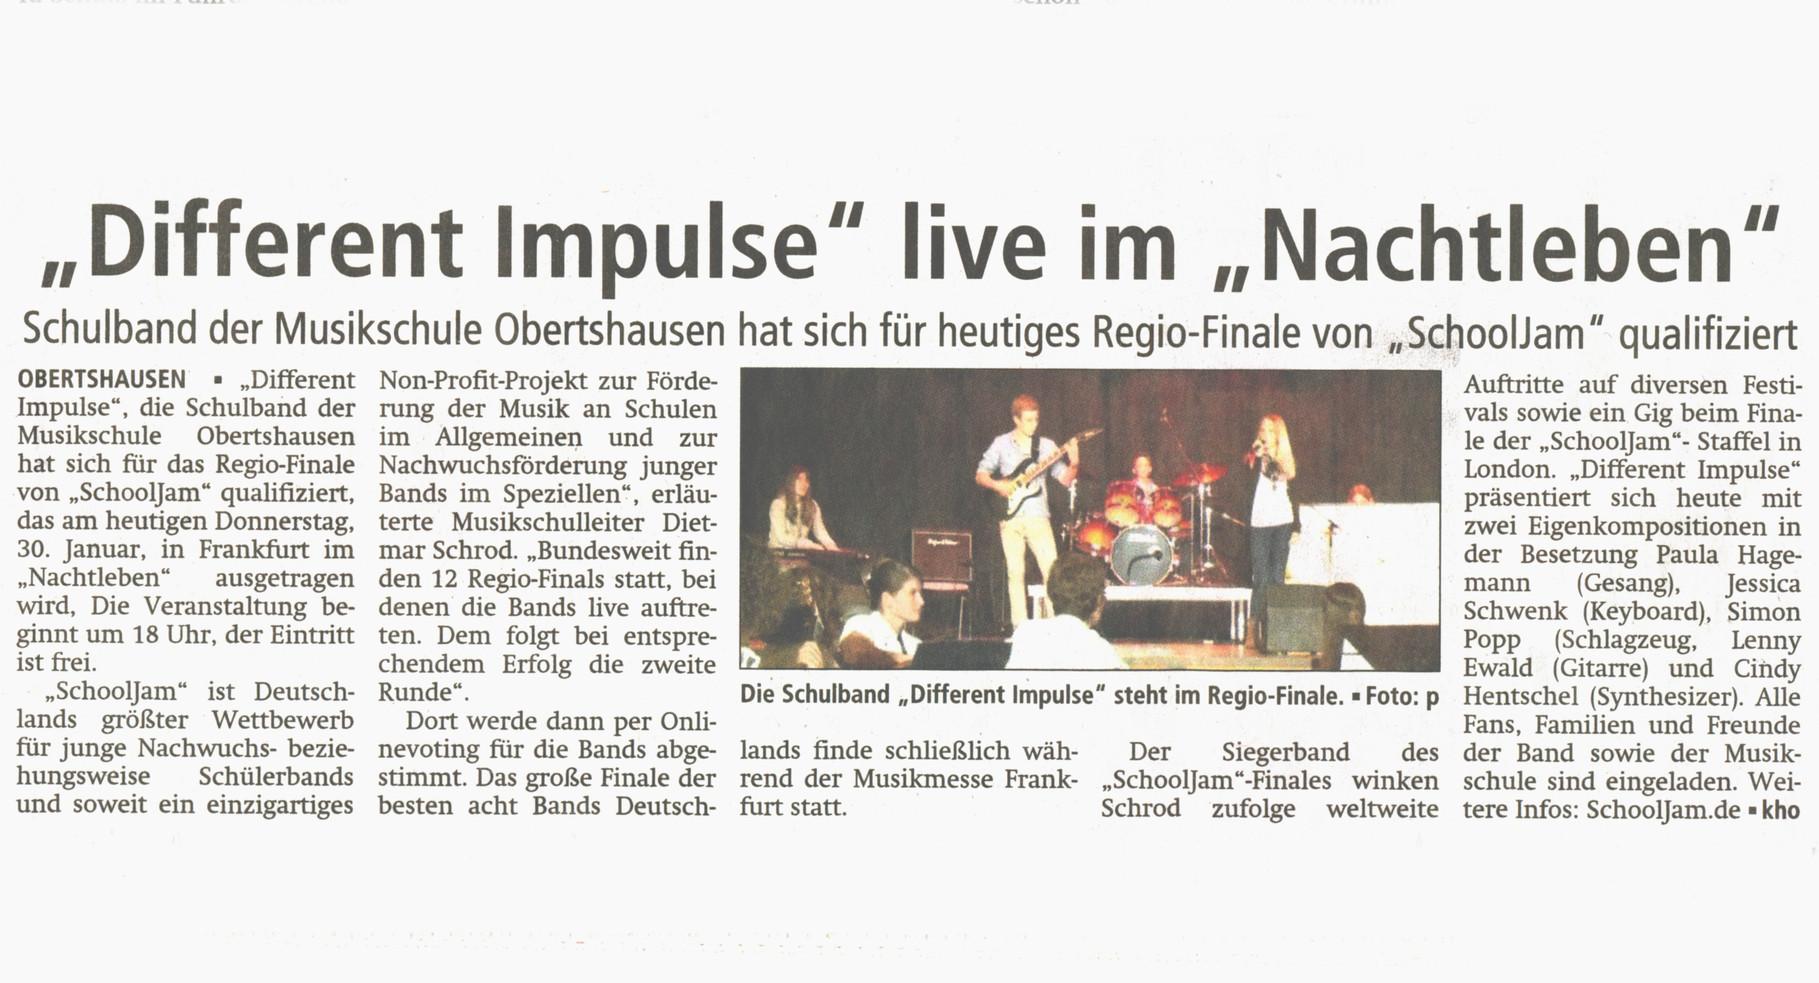 Offenbach Post, 30. Januar 2014